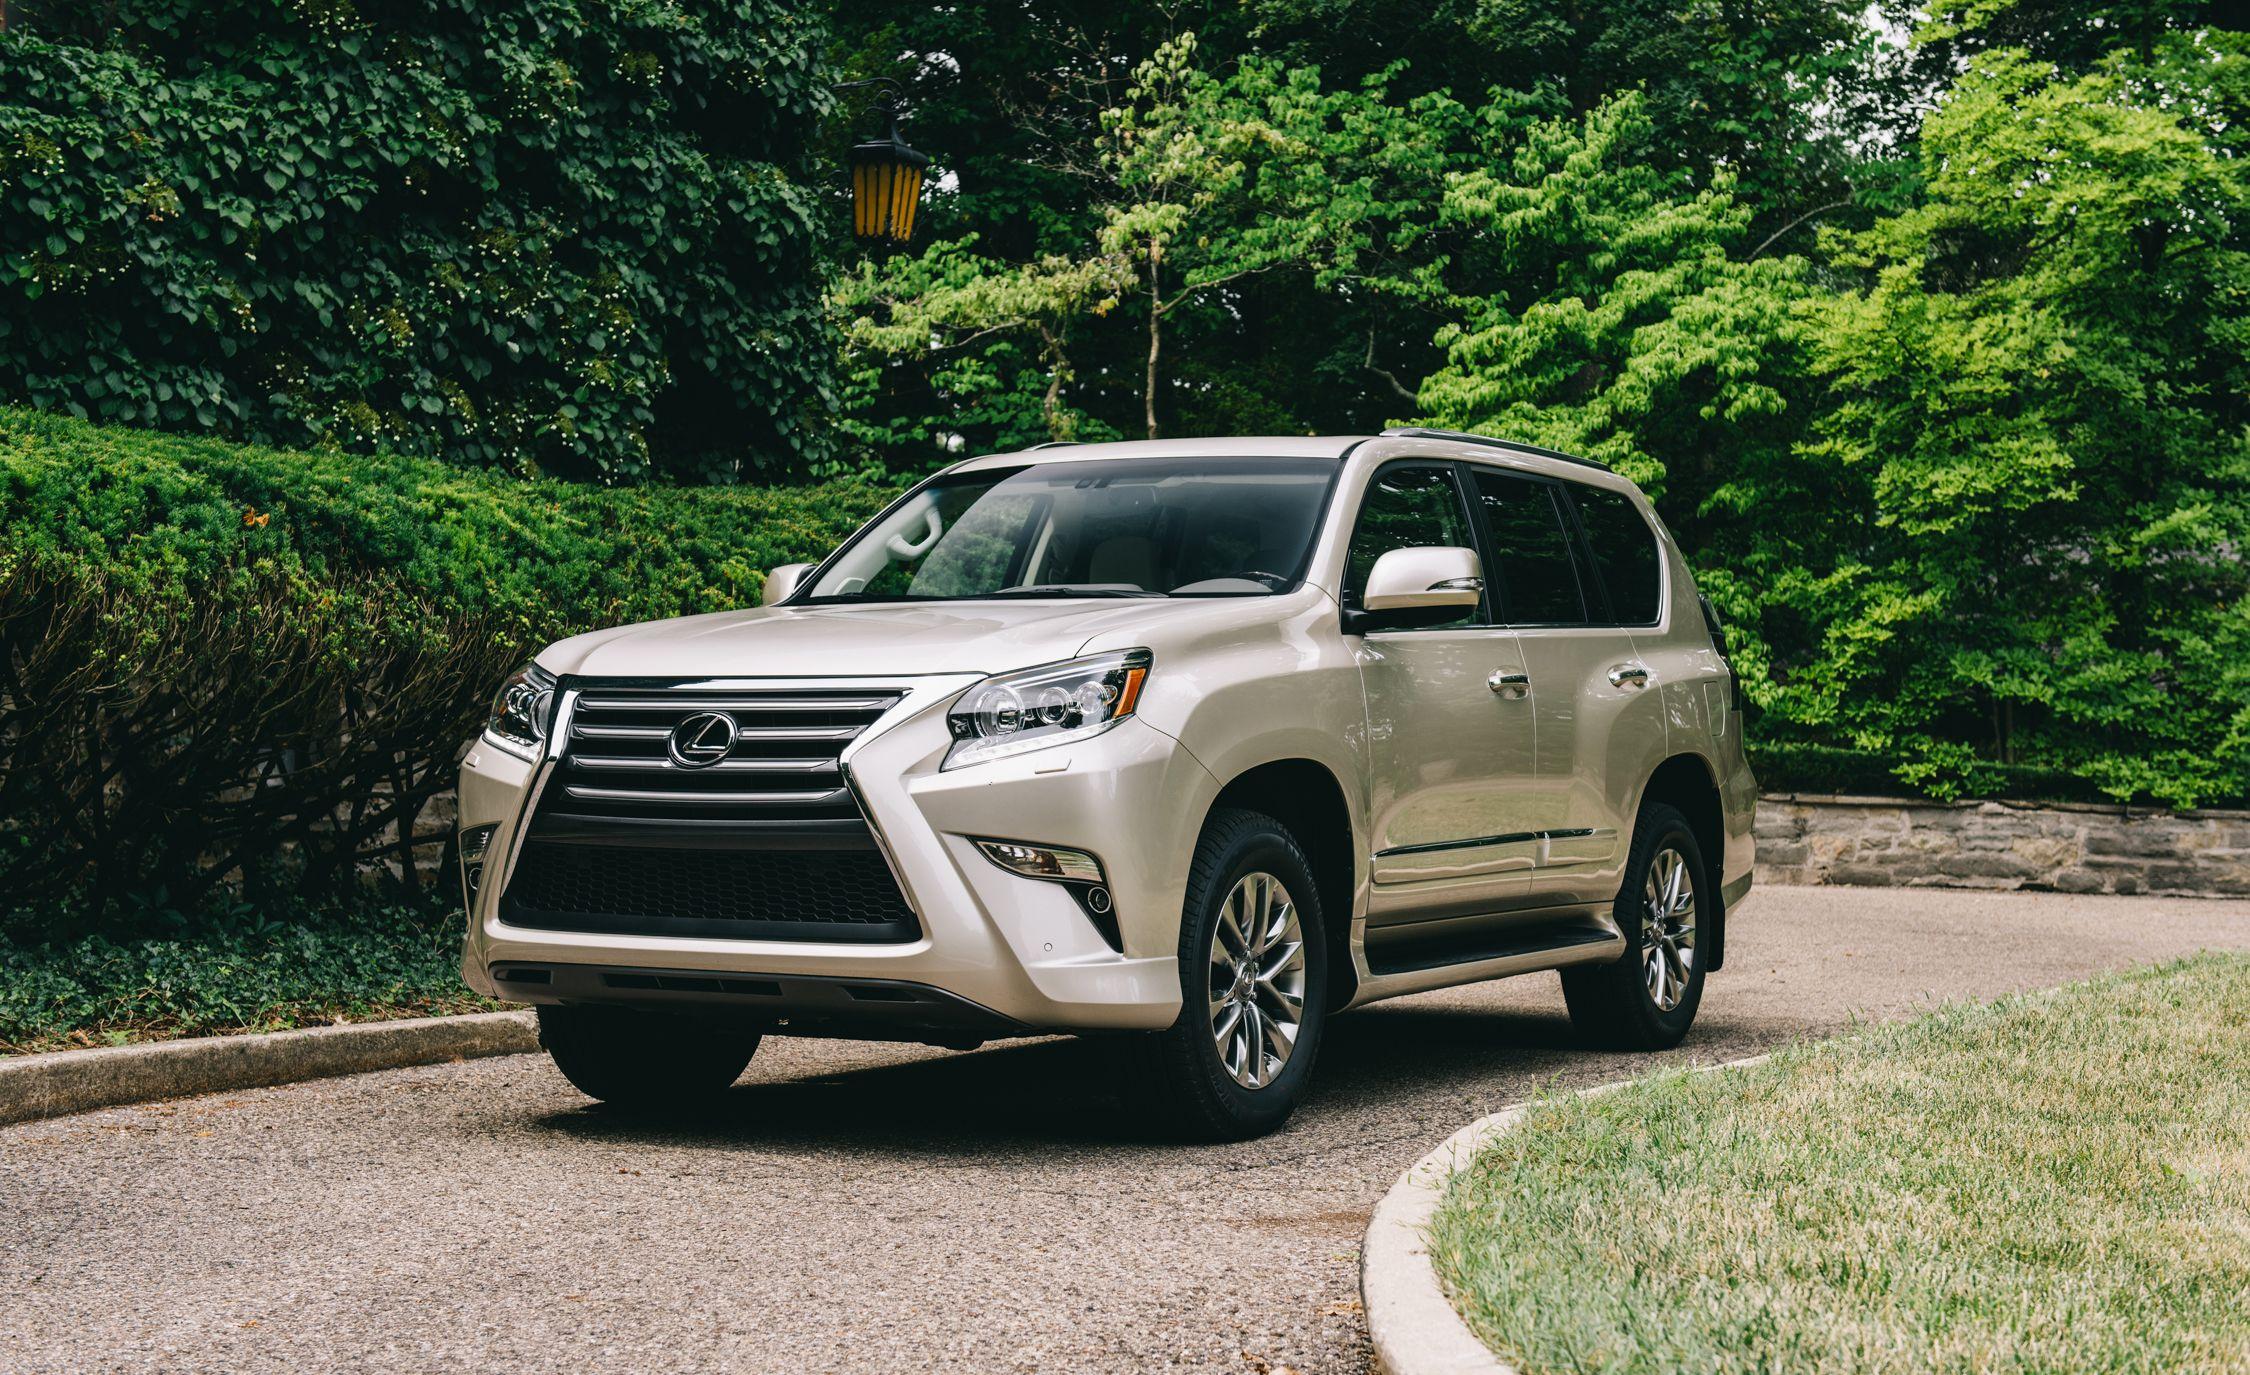 2019 Lexus Gx Reviews Price Photos And Specs Car Driver